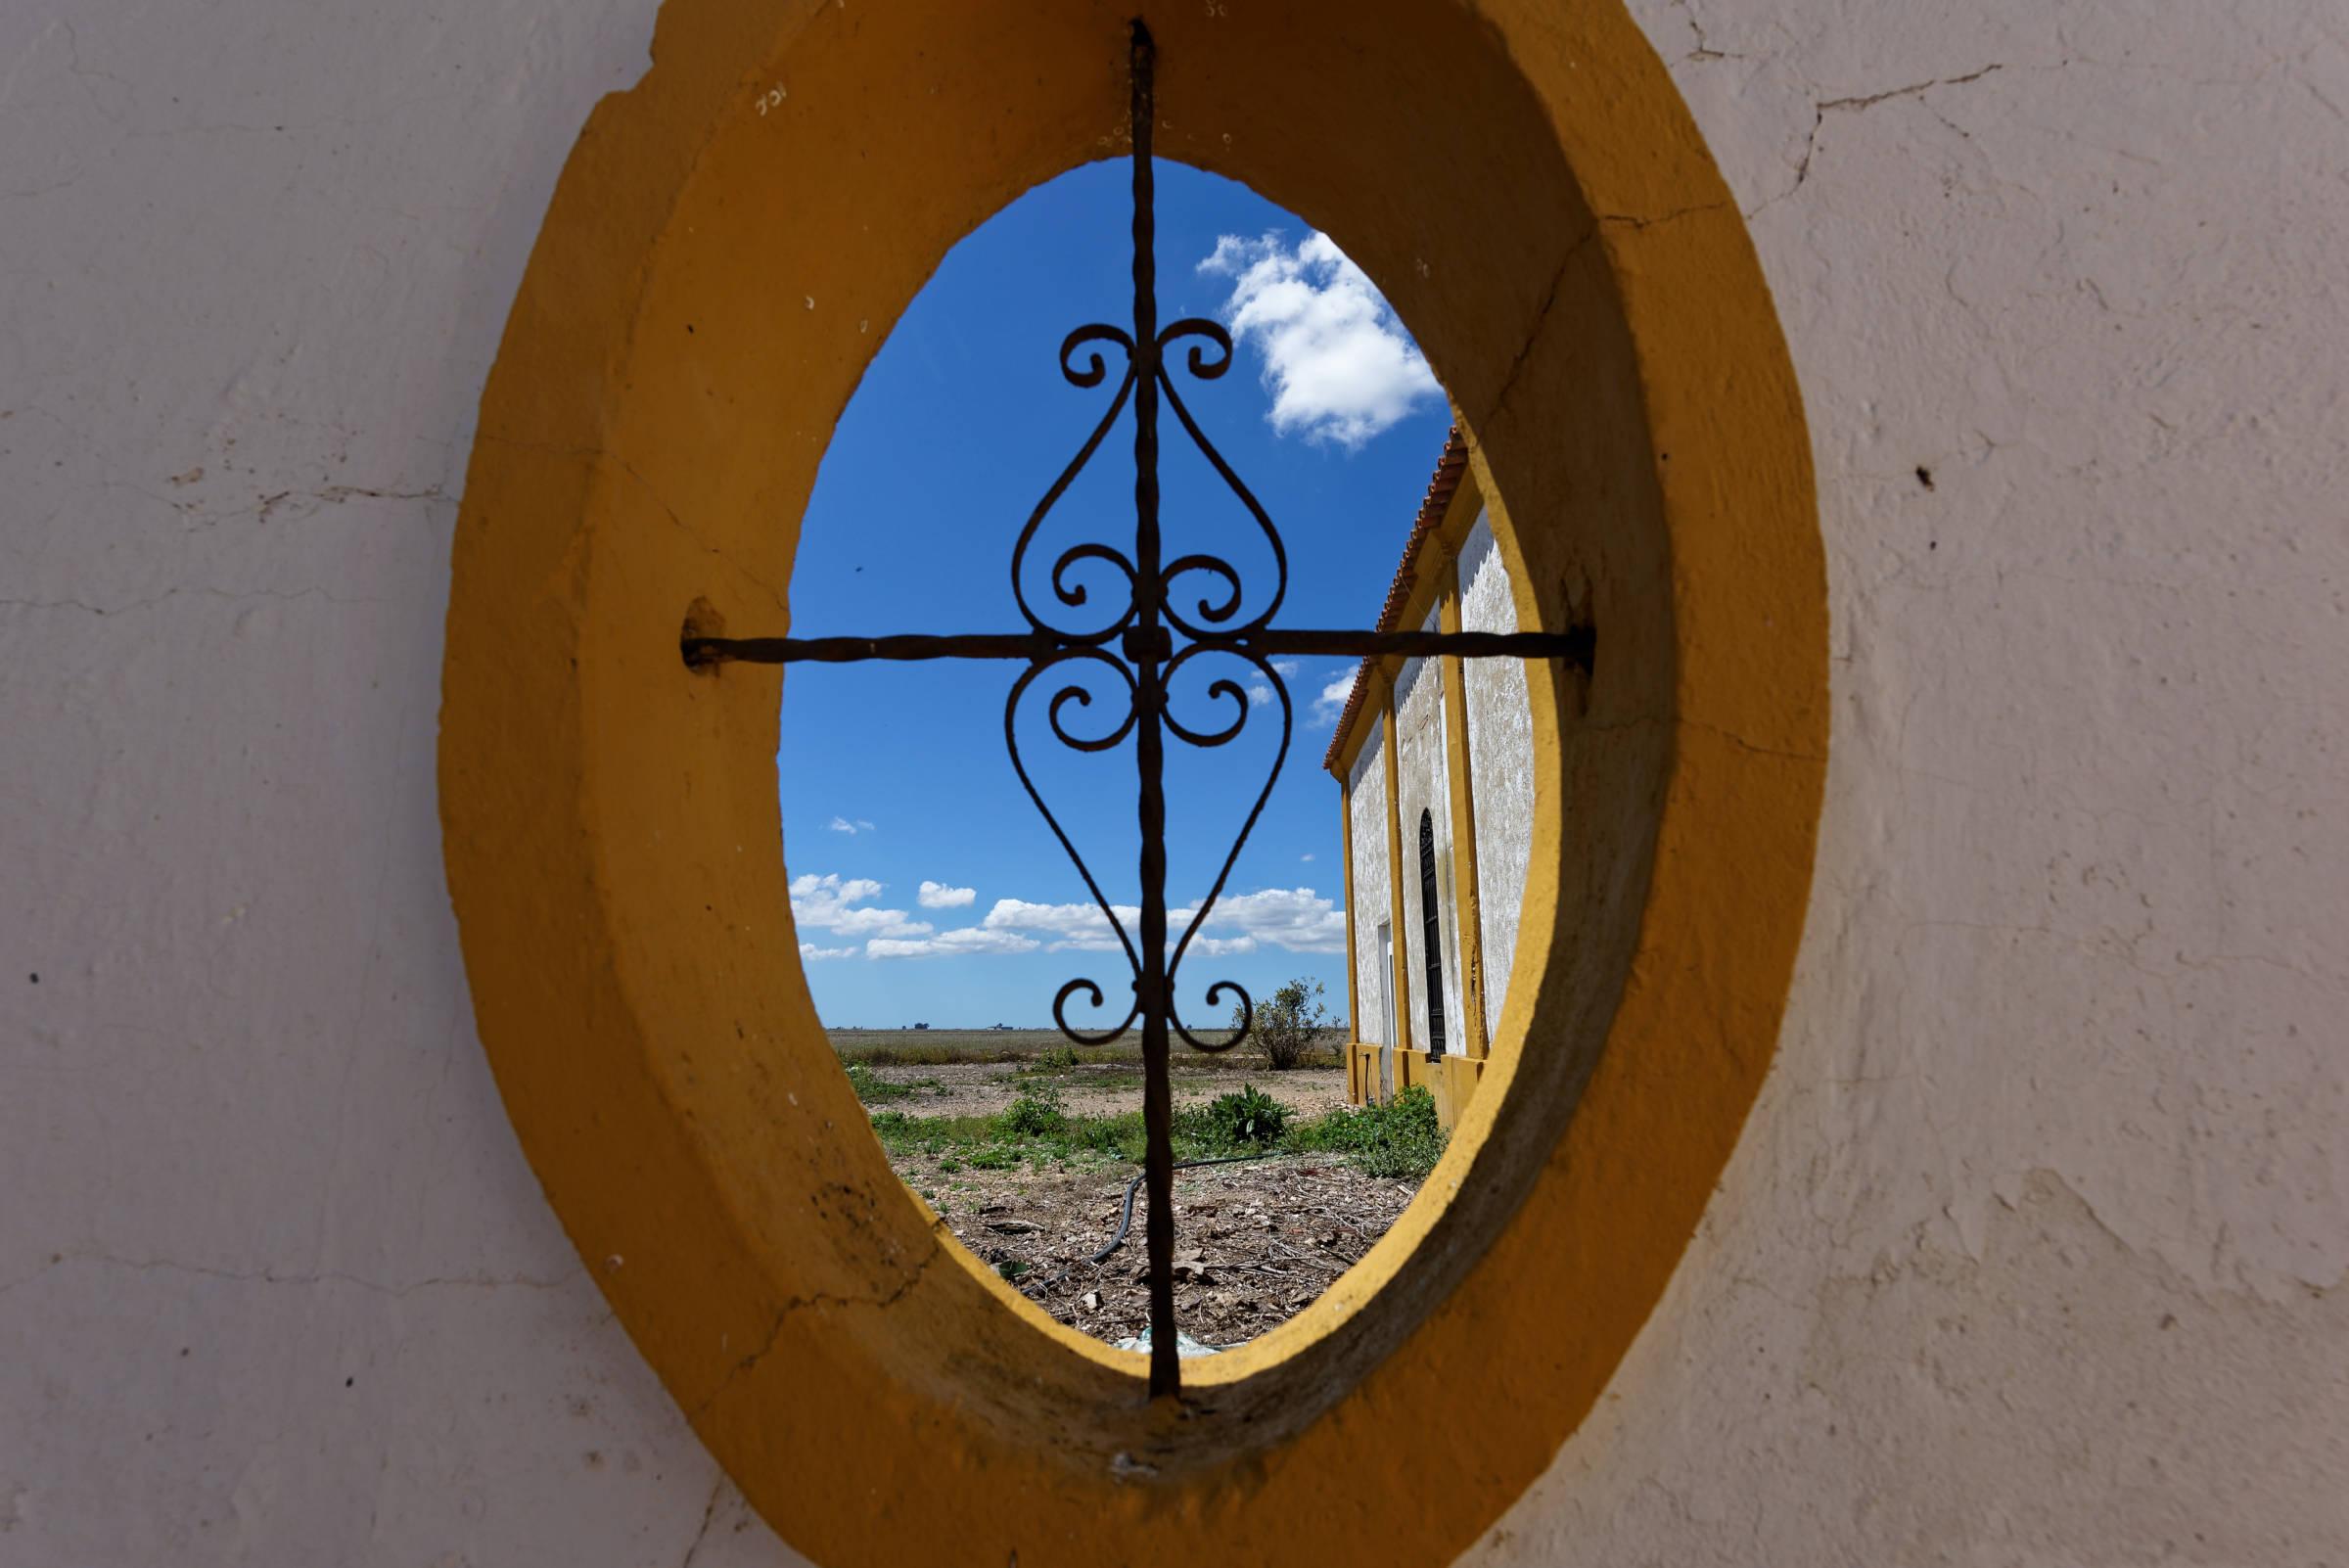 160414-Isla minima - Escobar (Andalousie) (40)